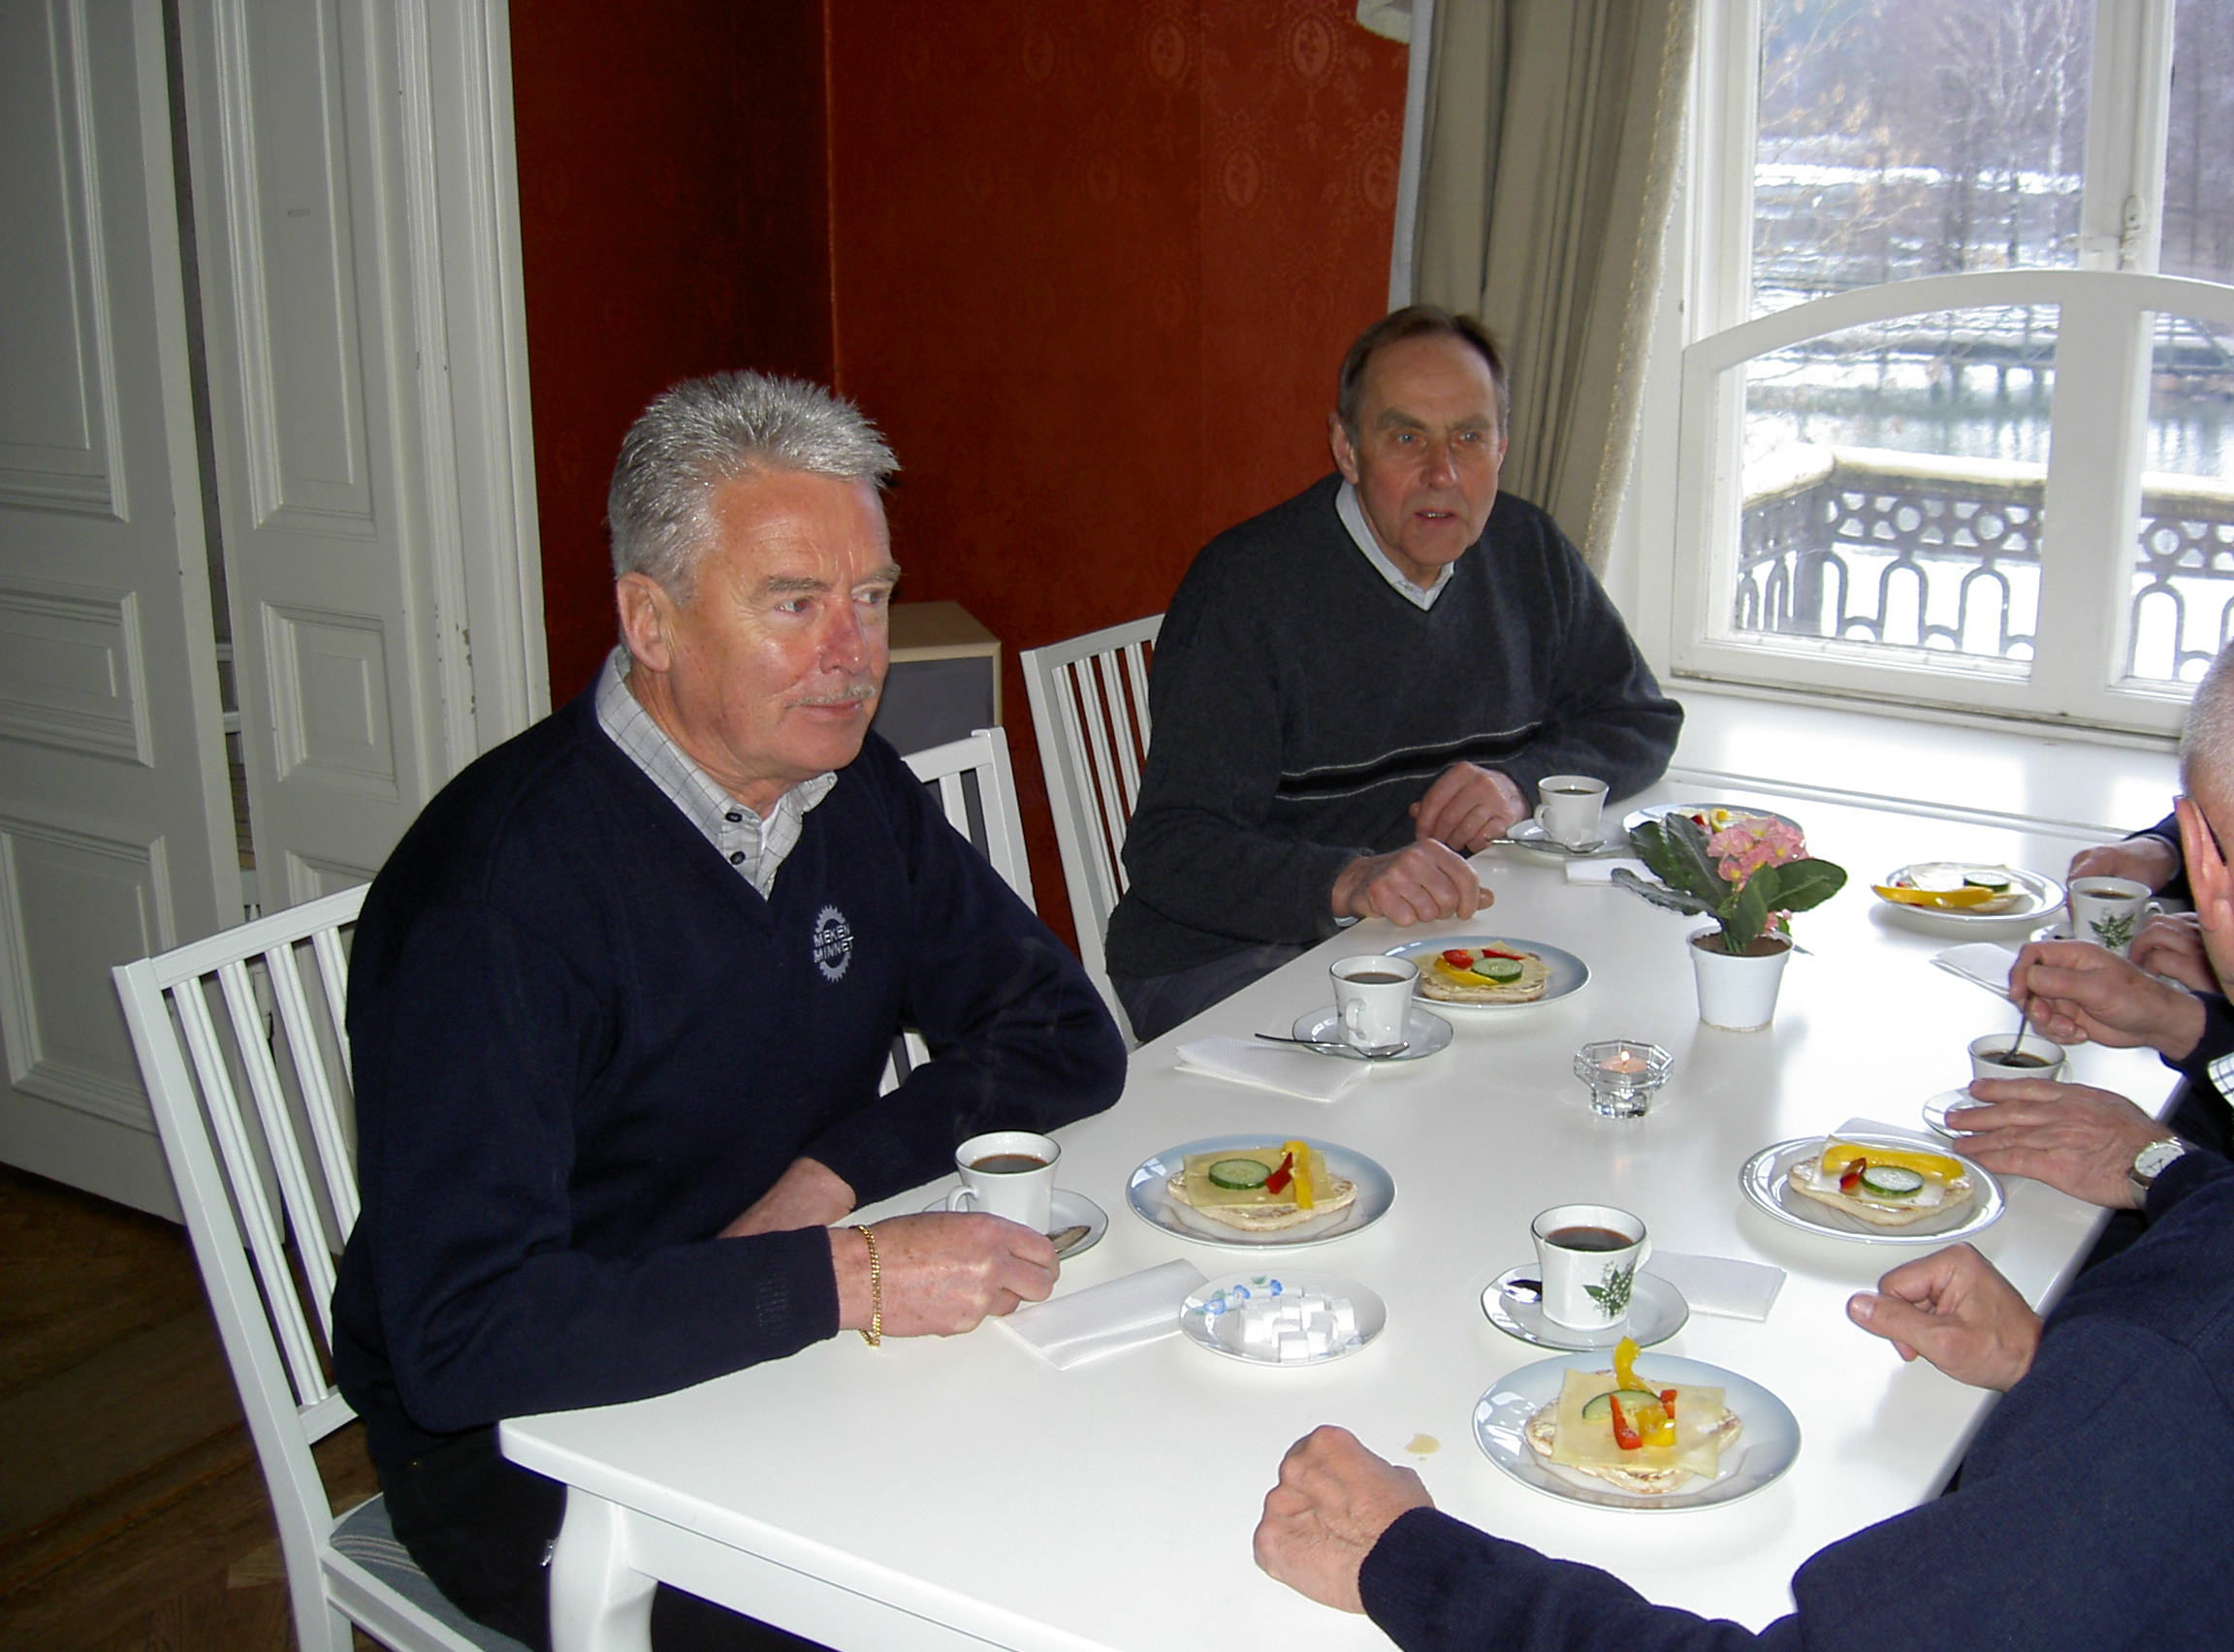 2006 Trollhättan - 13